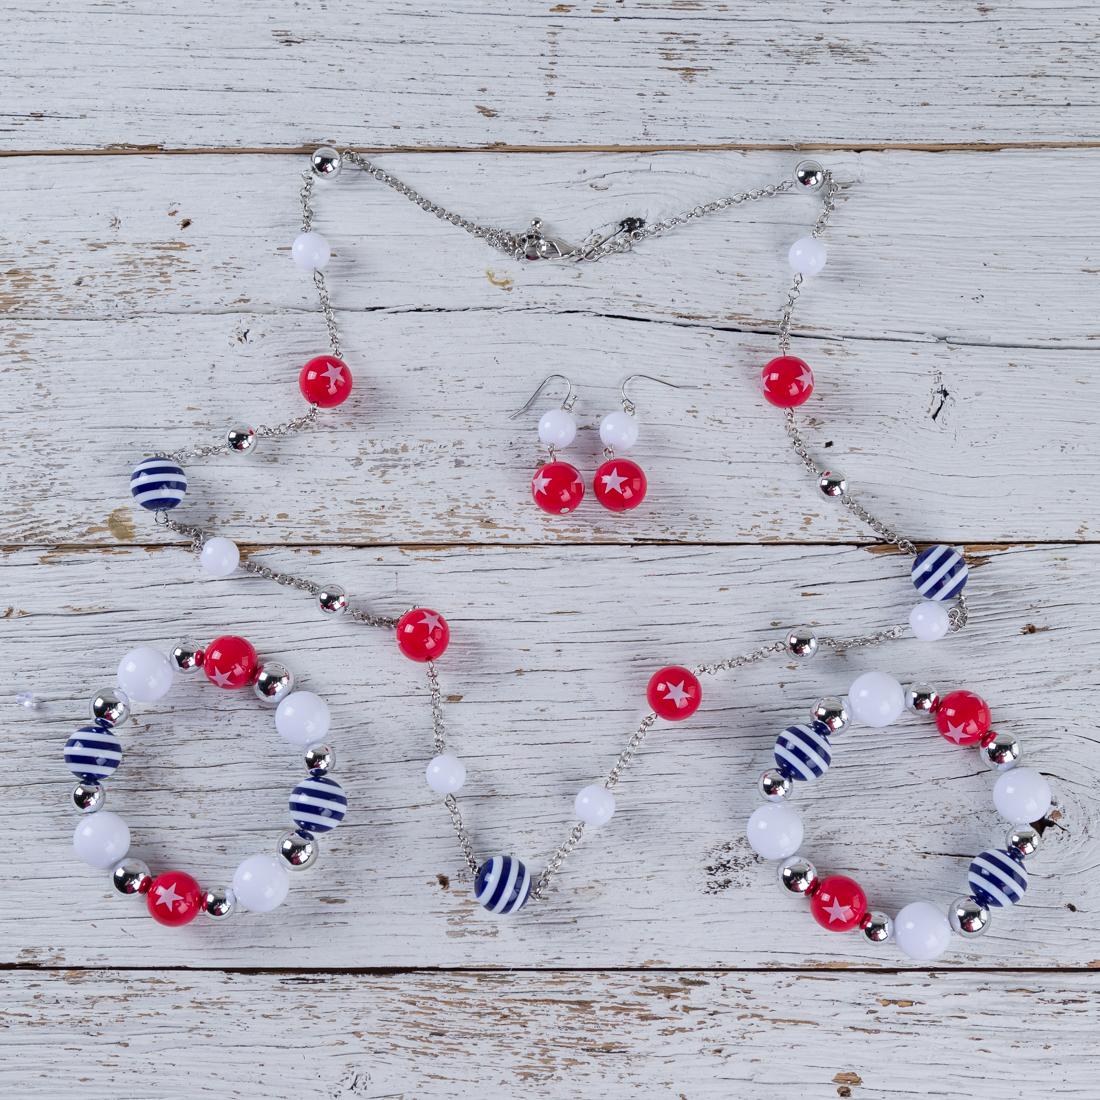 01368d2cd Jewelry | Clothing Accessories - Cracker Barrel